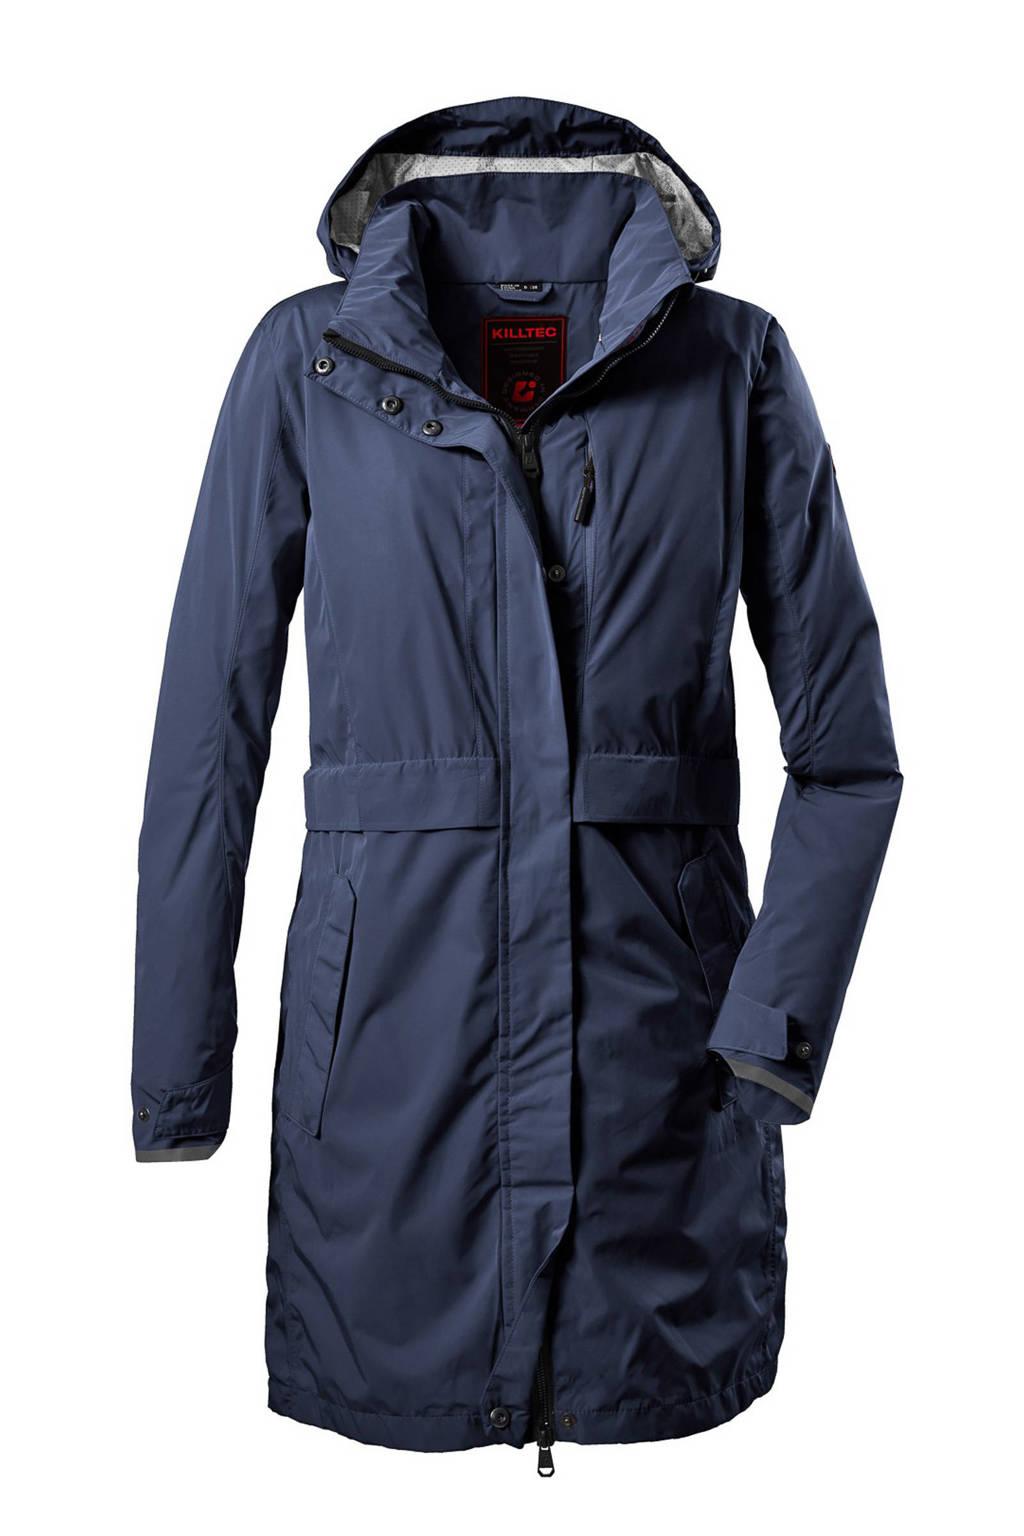 Killtec outdoor jas Esbo donkerblauw, Donkerblauw